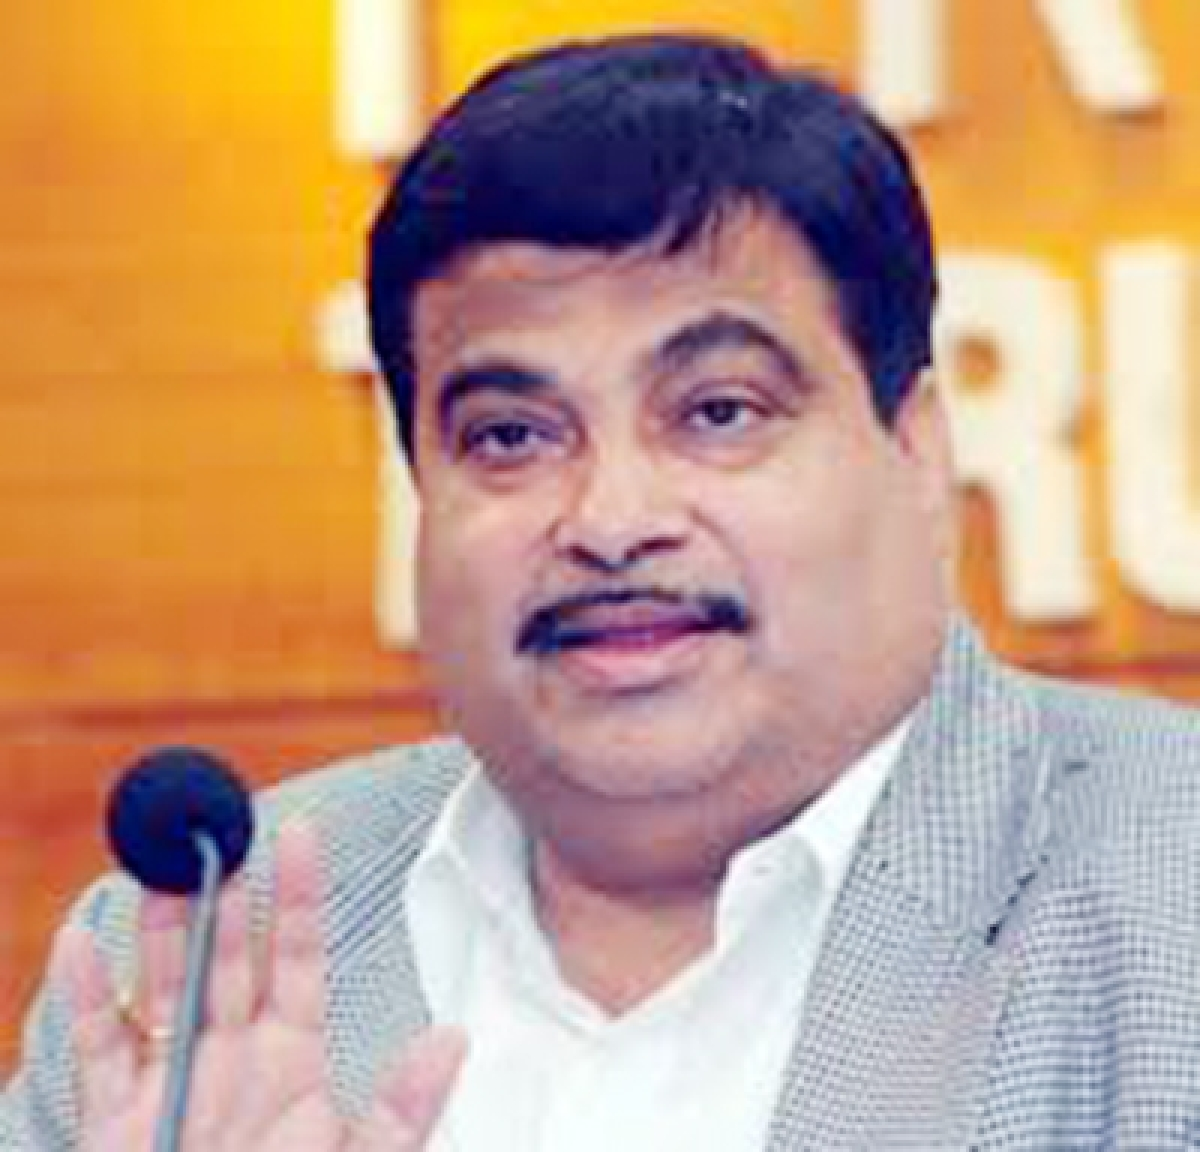 Marinas to  come up in  Goa, says Gadkari